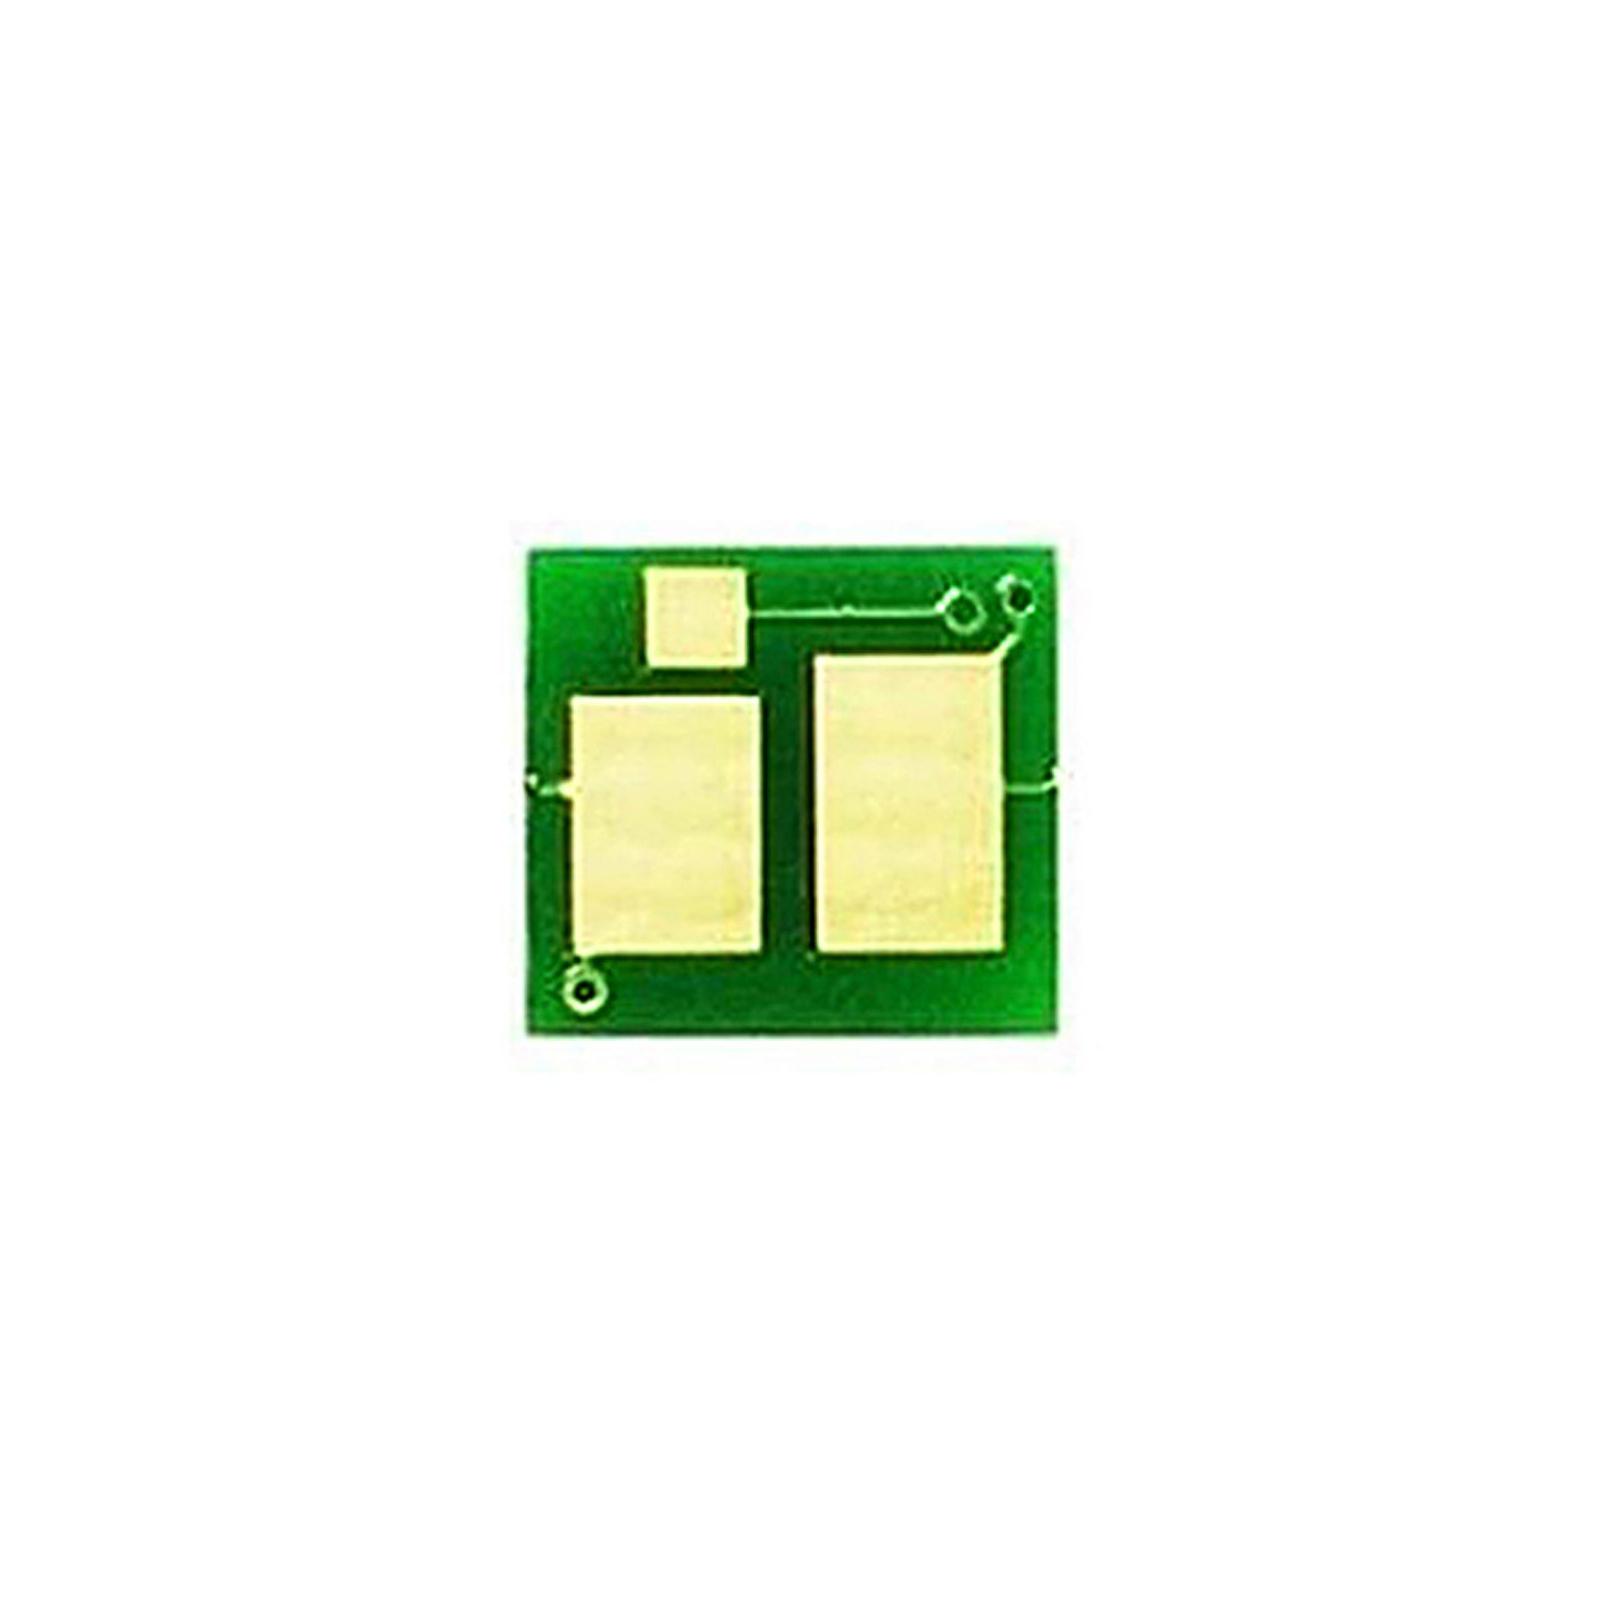 Чип для картриджа HP CLJ M254 2.5k magenta (CF543X) Static Control (HM254CP-HYMAEU)